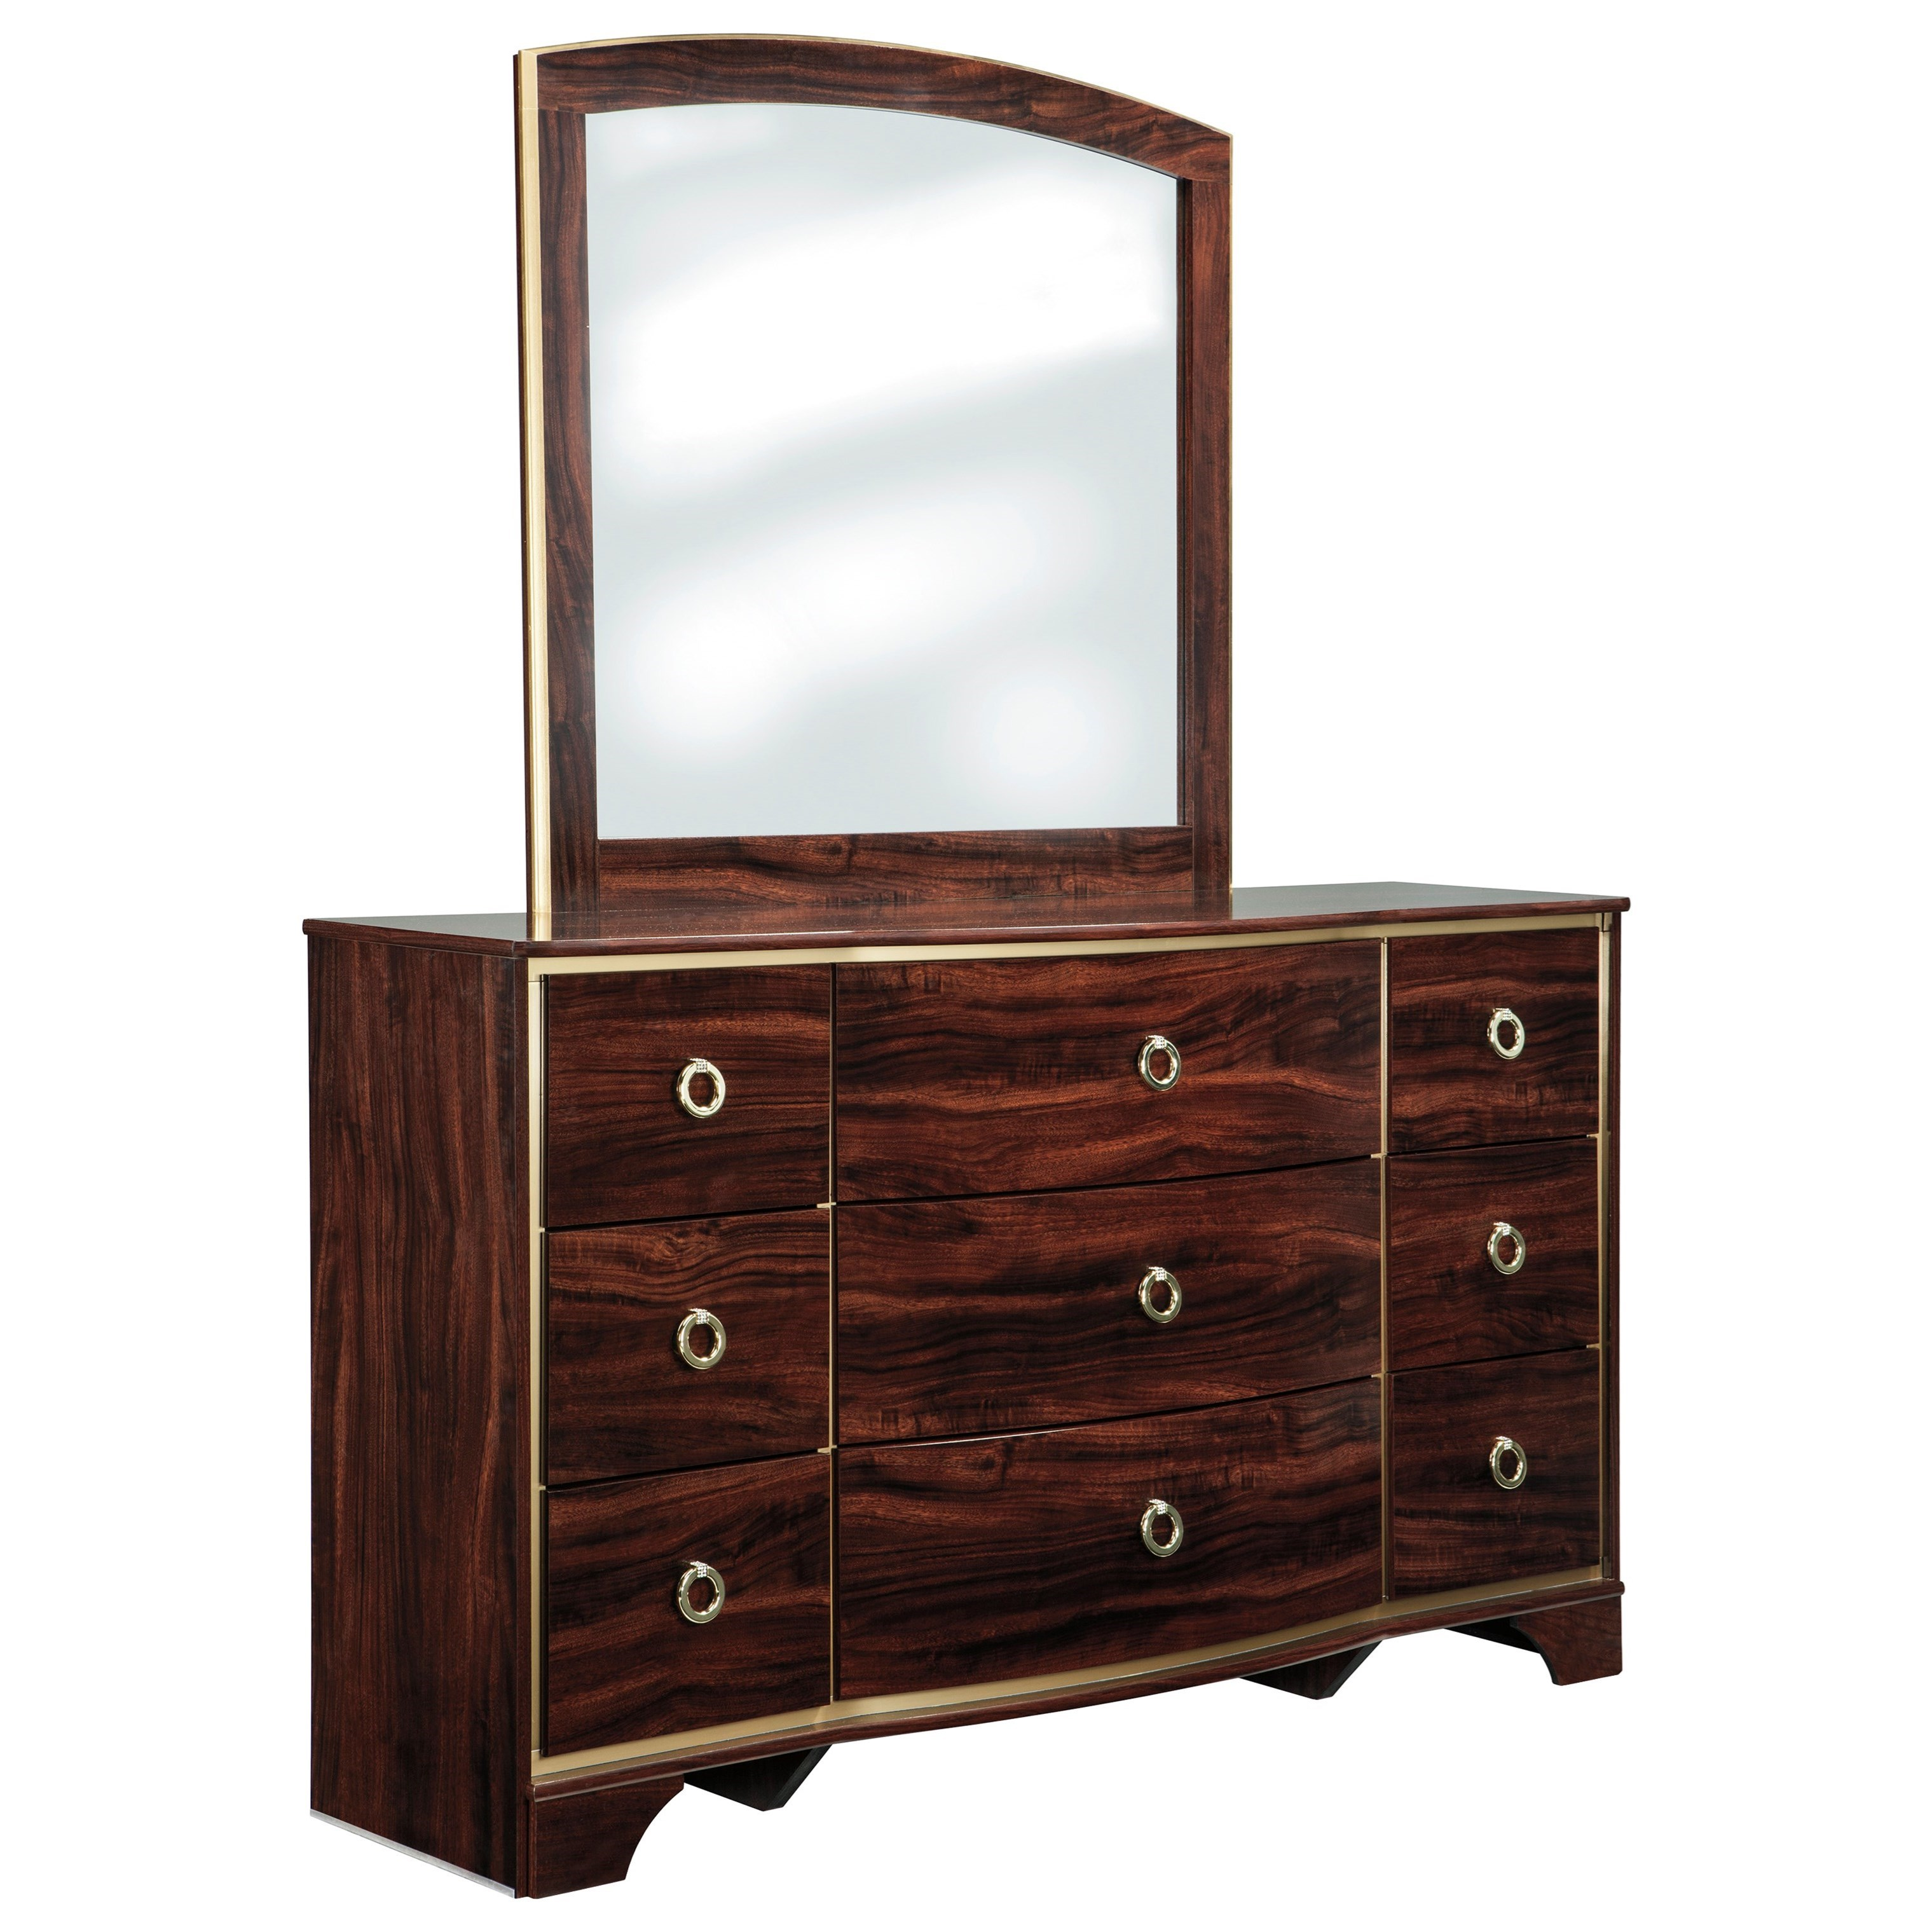 Signature design by ashley lenmara dresser bedroom for Bedroom bureau knobs